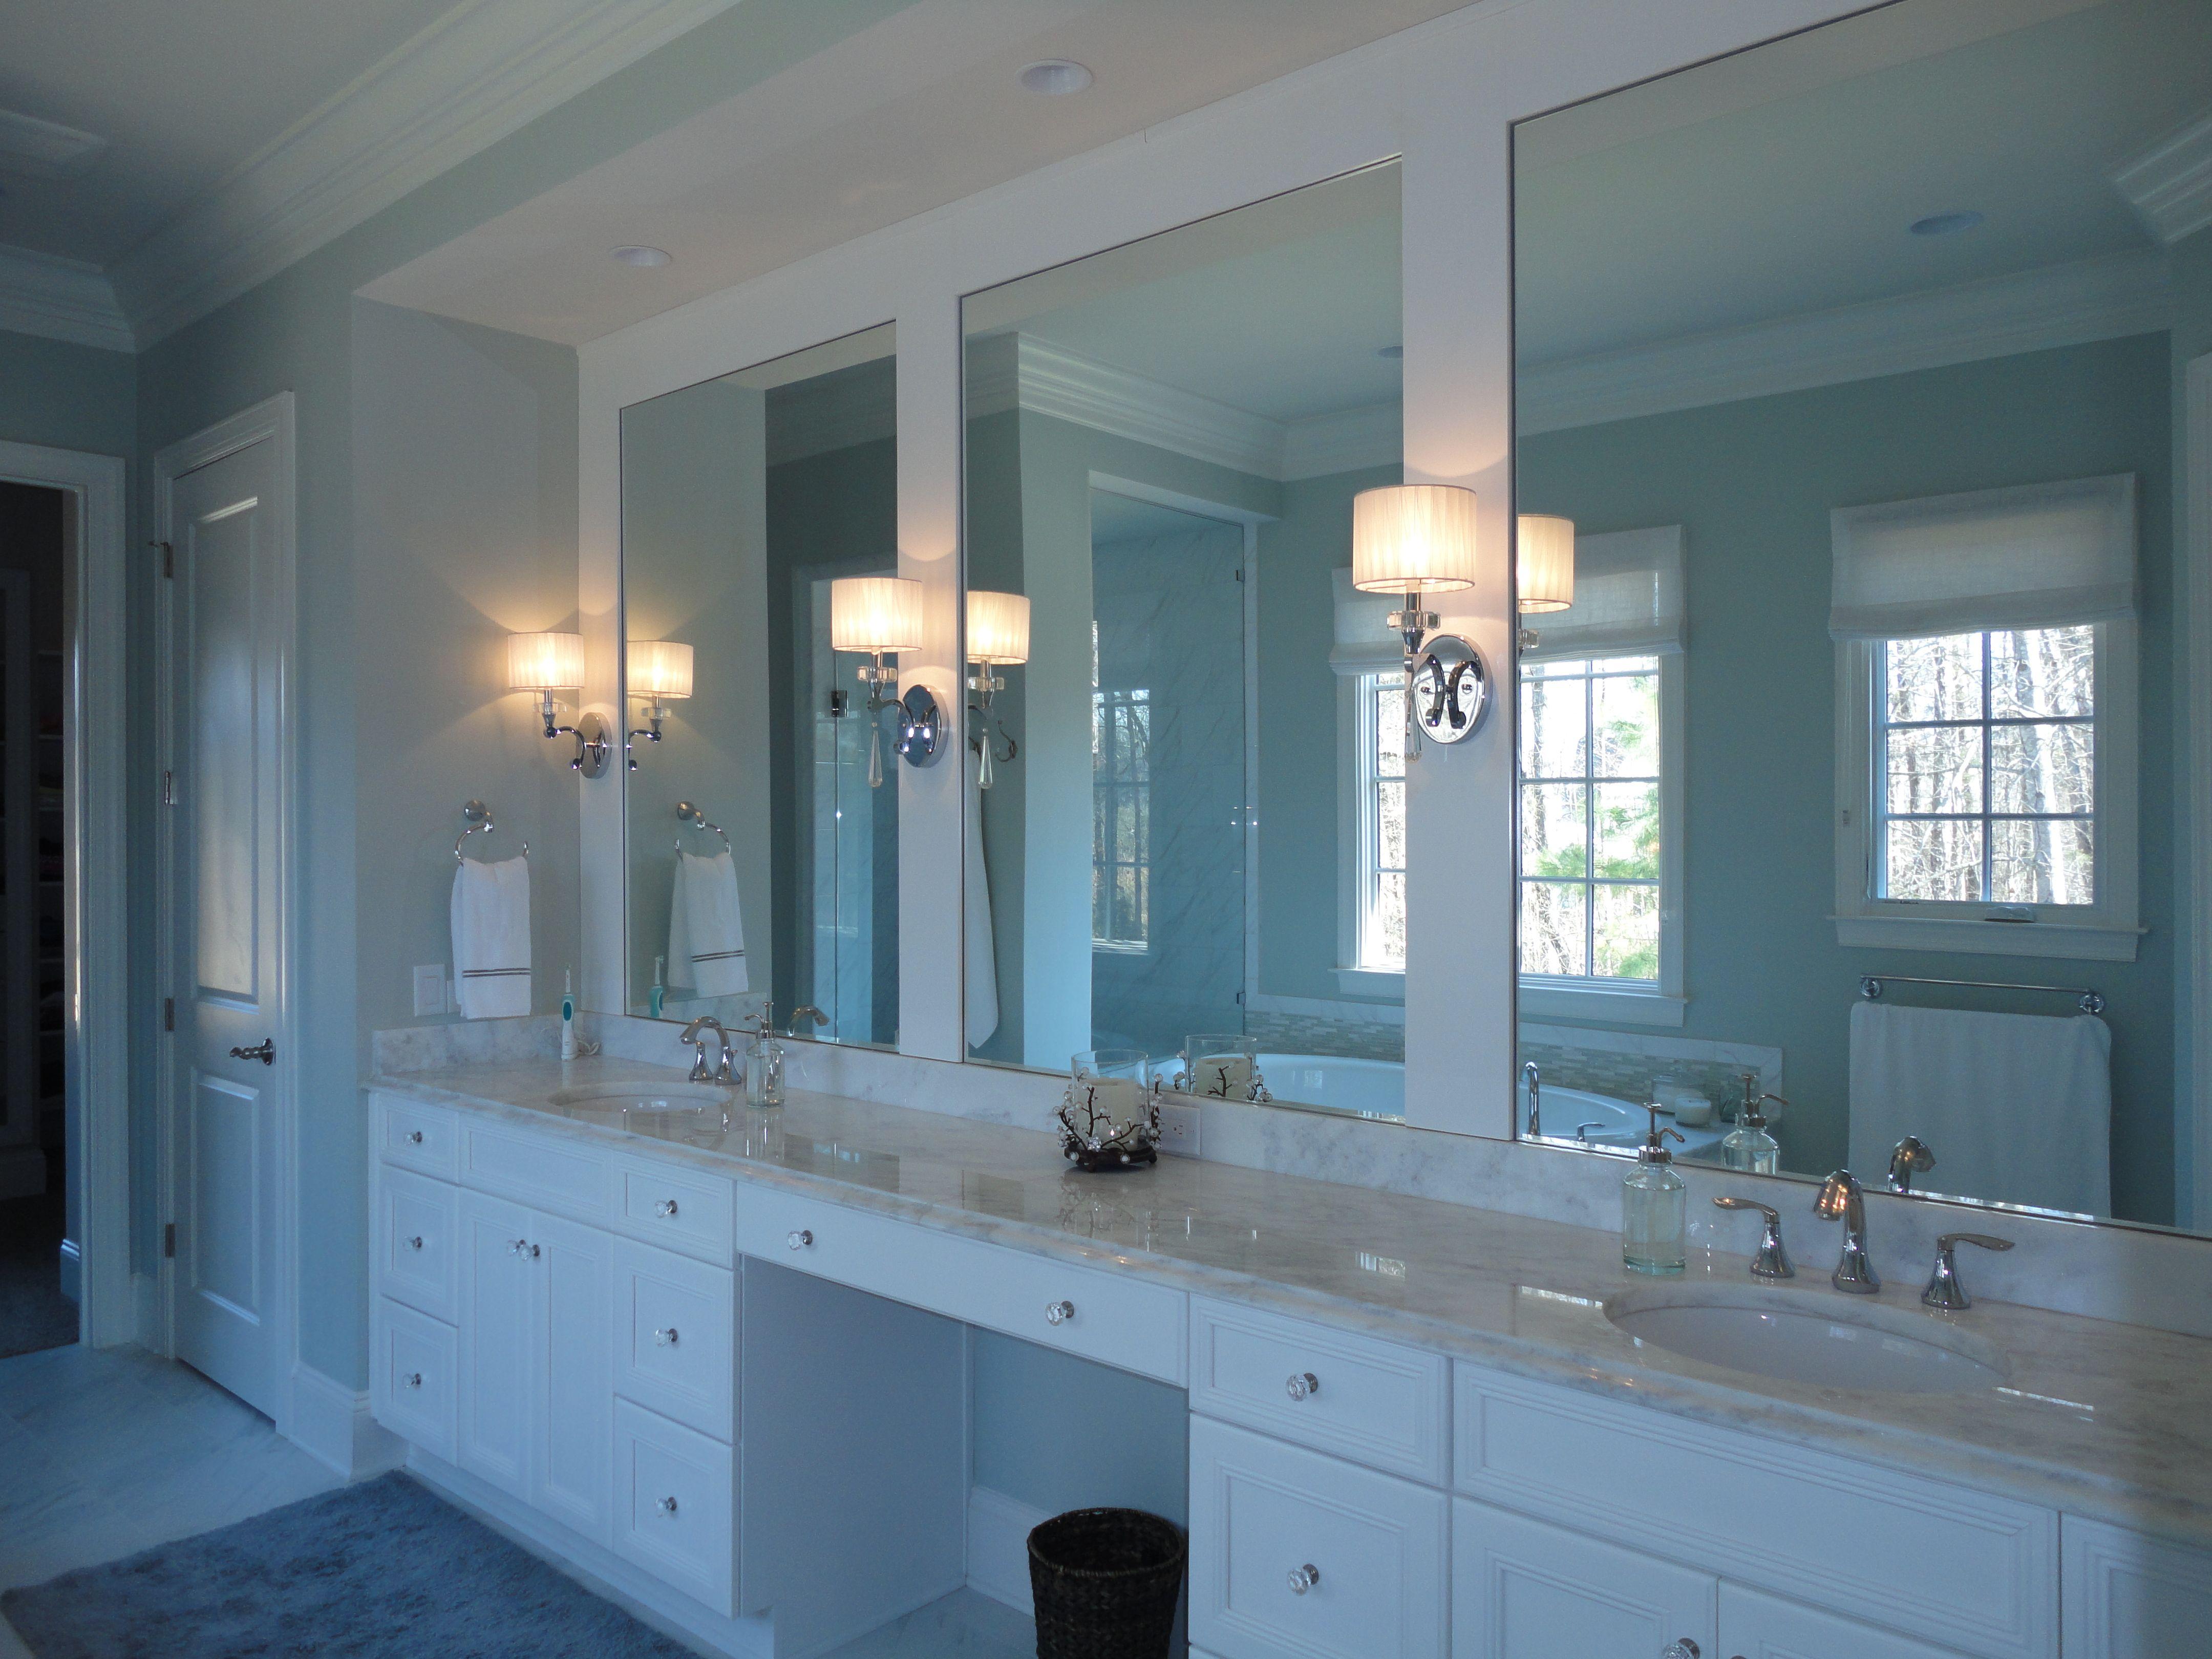 Modern Master Bathroom Tile Pattern - Bathroom - knawi.com